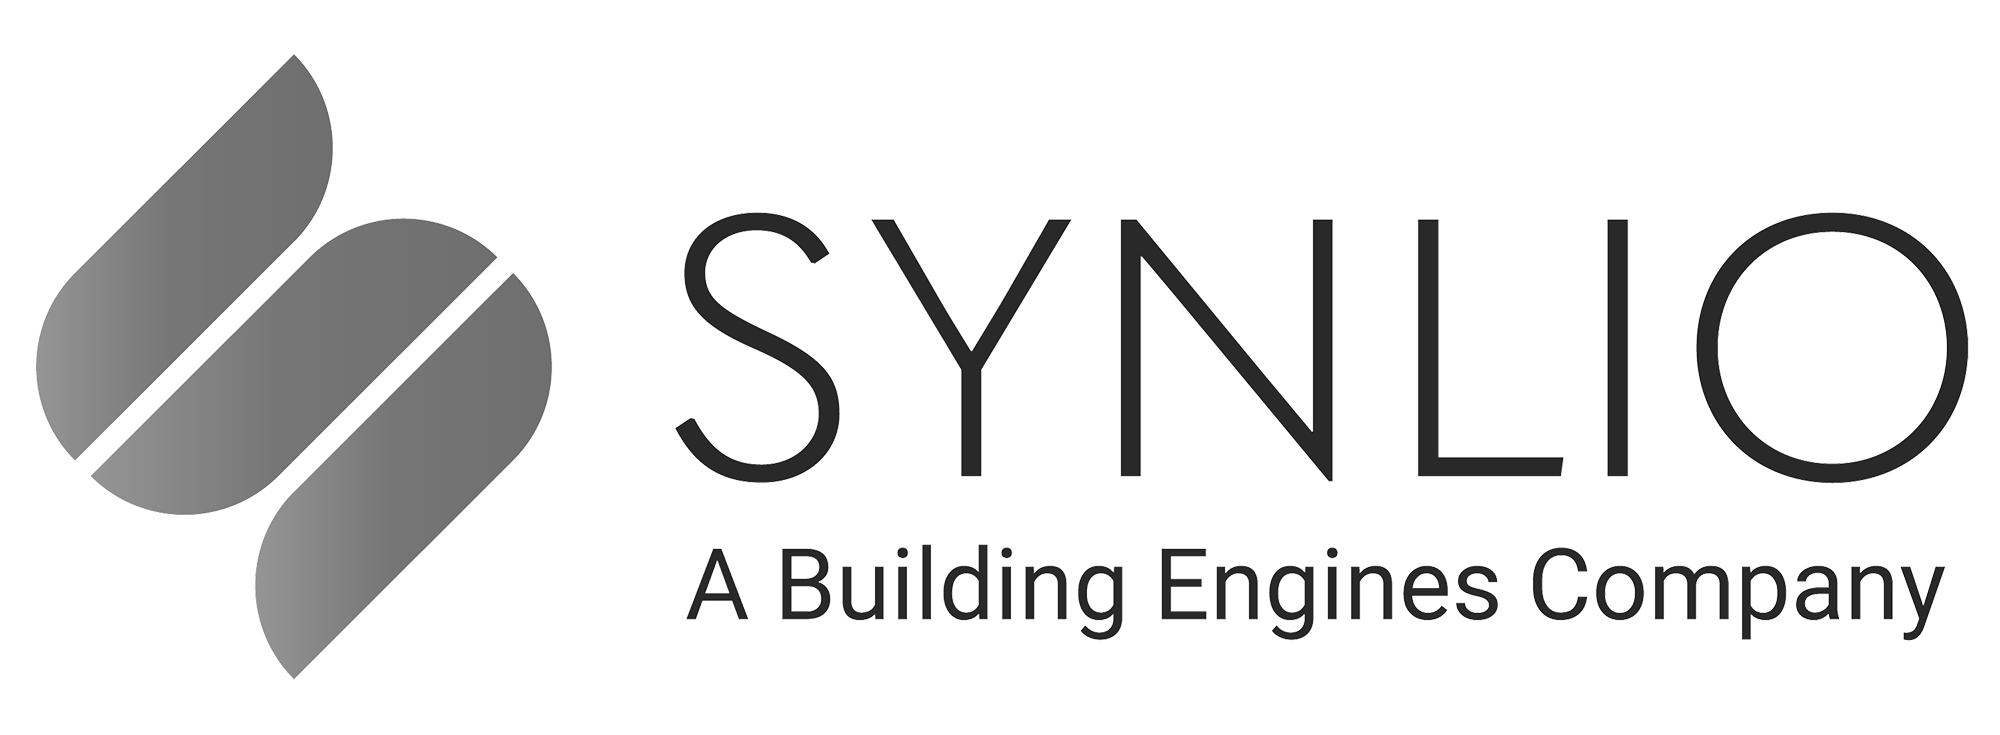 CEO Coaching International congratulates Synlio